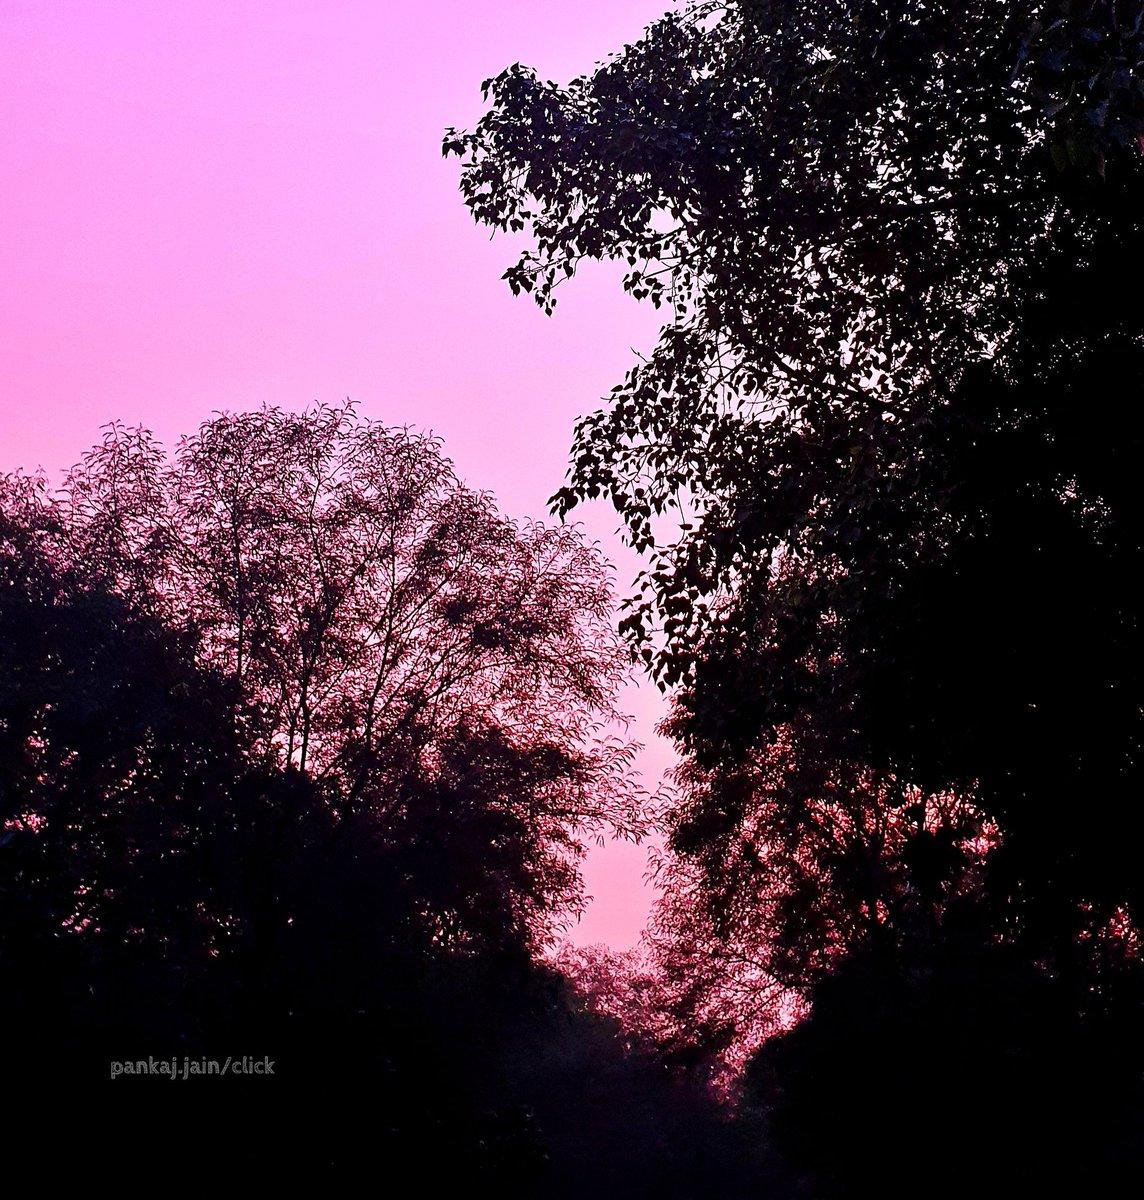 दिल्ली में कुछ देर पहले आसमान का रंग ... #MobileClick By @PankajJainClick